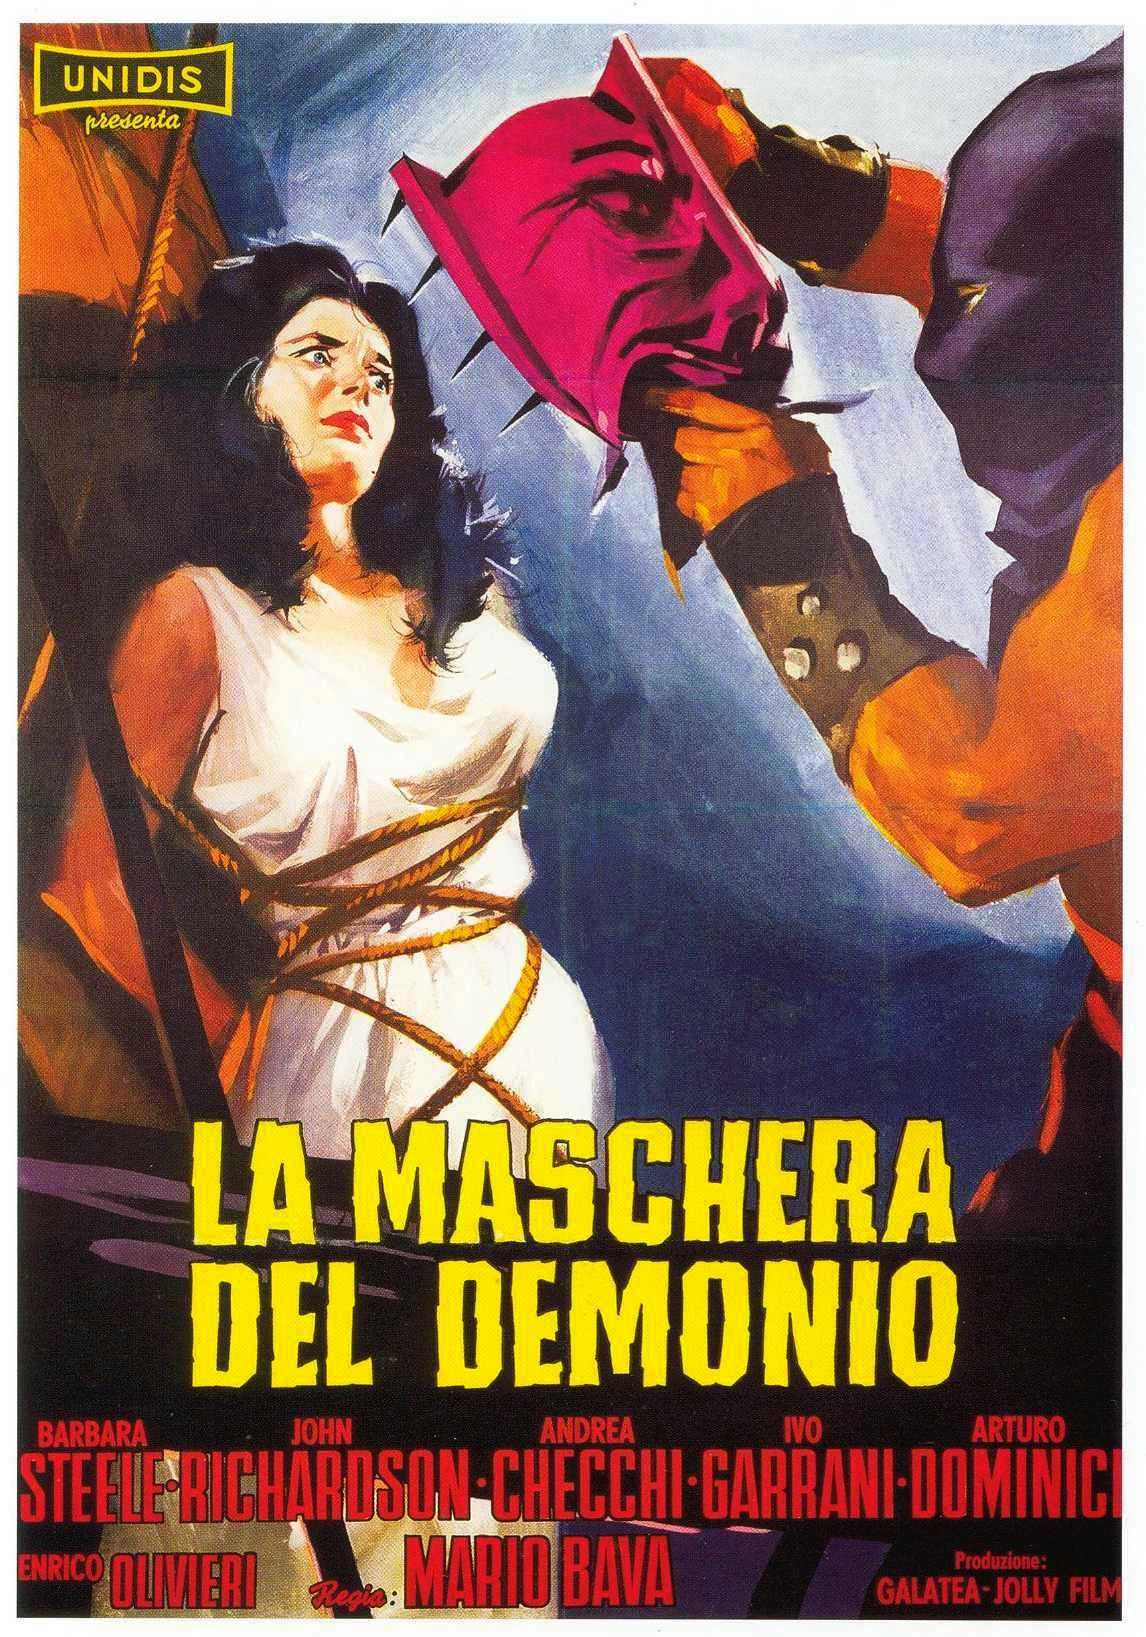 La maschera del demonio - Mario Bava 1960